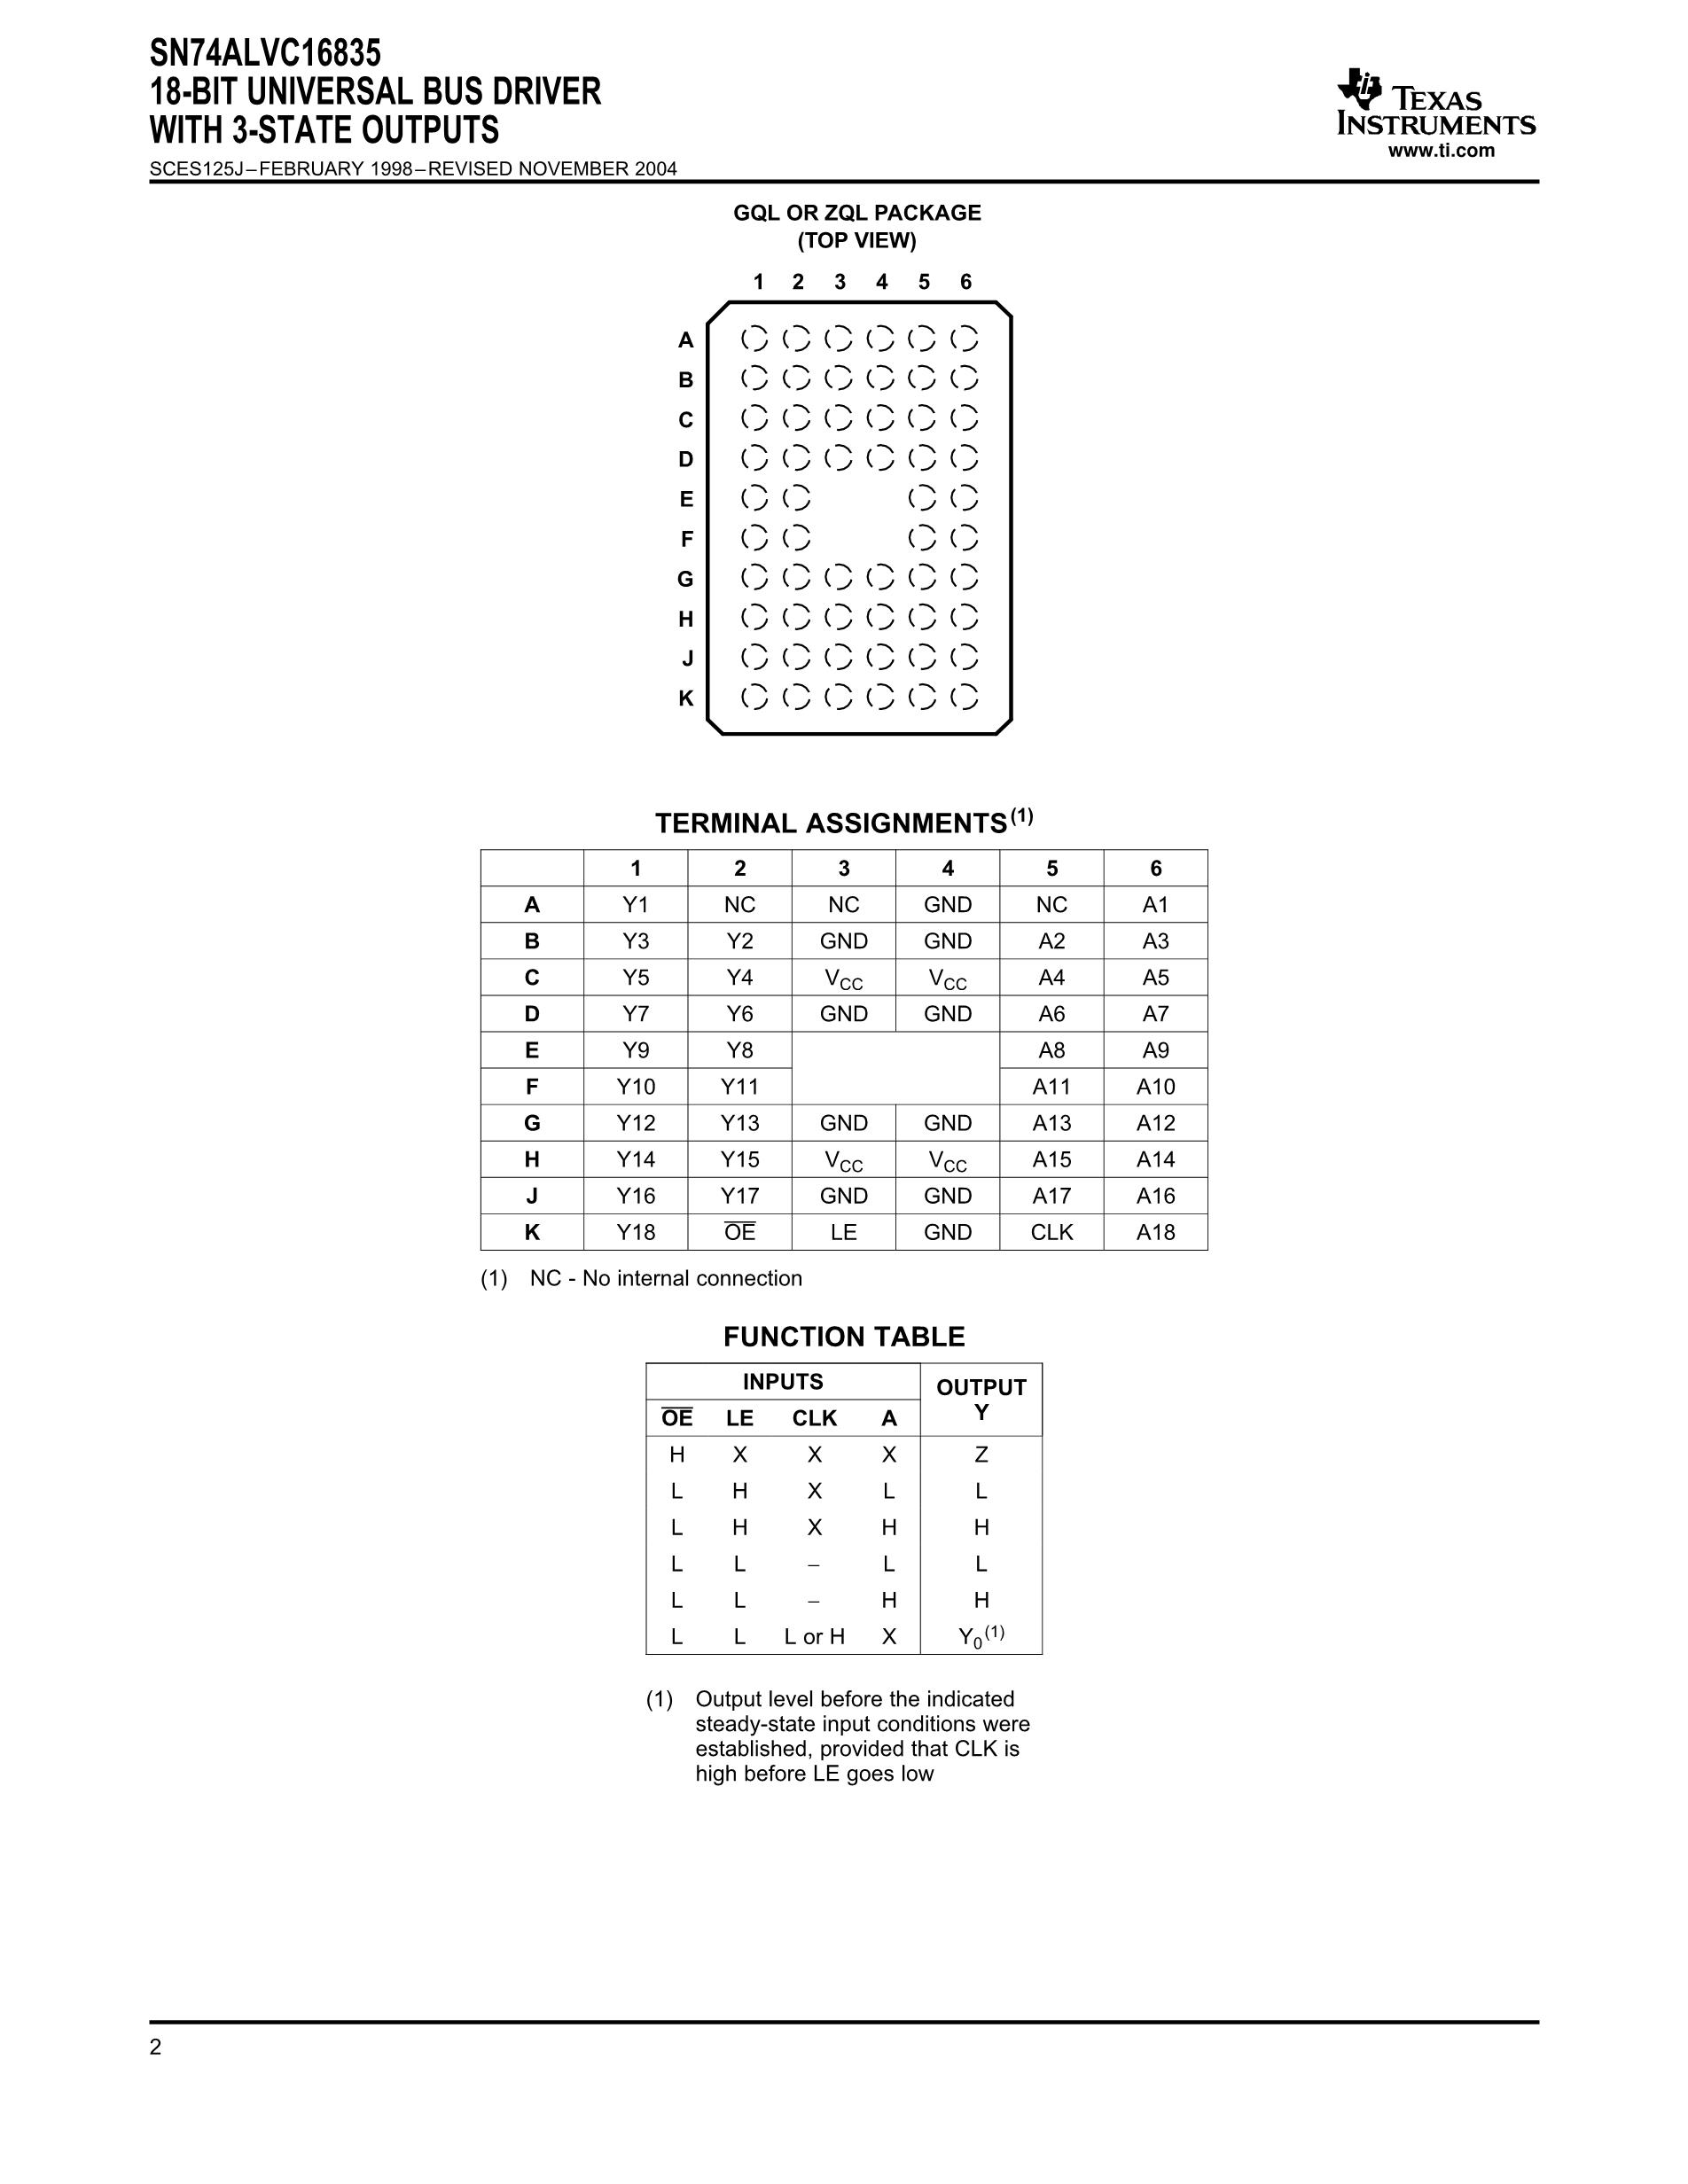 SN74ALVC16835DGVR's pdf picture 2